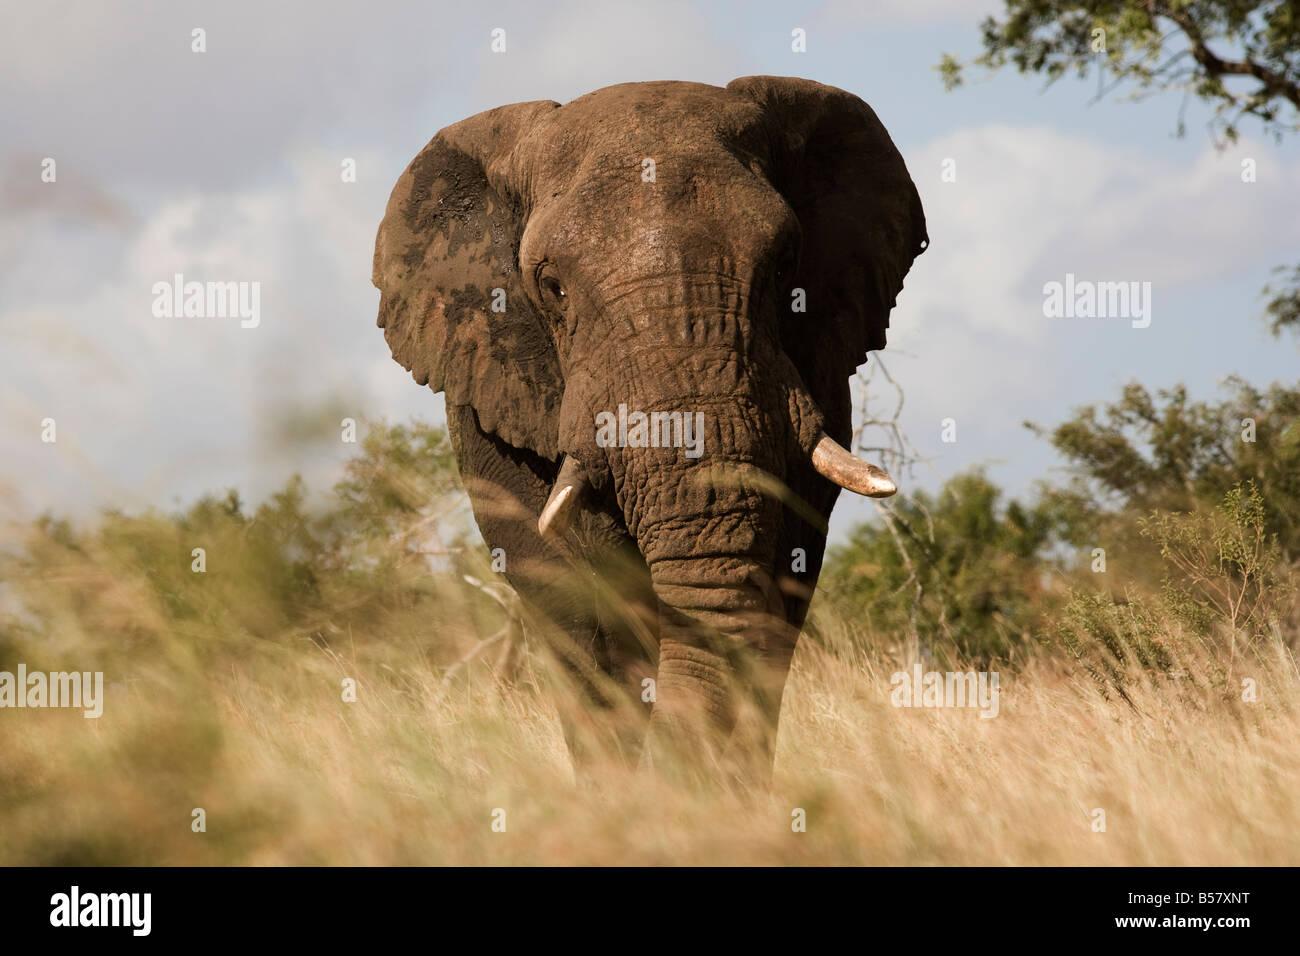 Elefante africano bull (Loxodonta africana), il Parco Nazionale Kruger, Mpumalanga, Sud Africa e Africa Immagini Stock